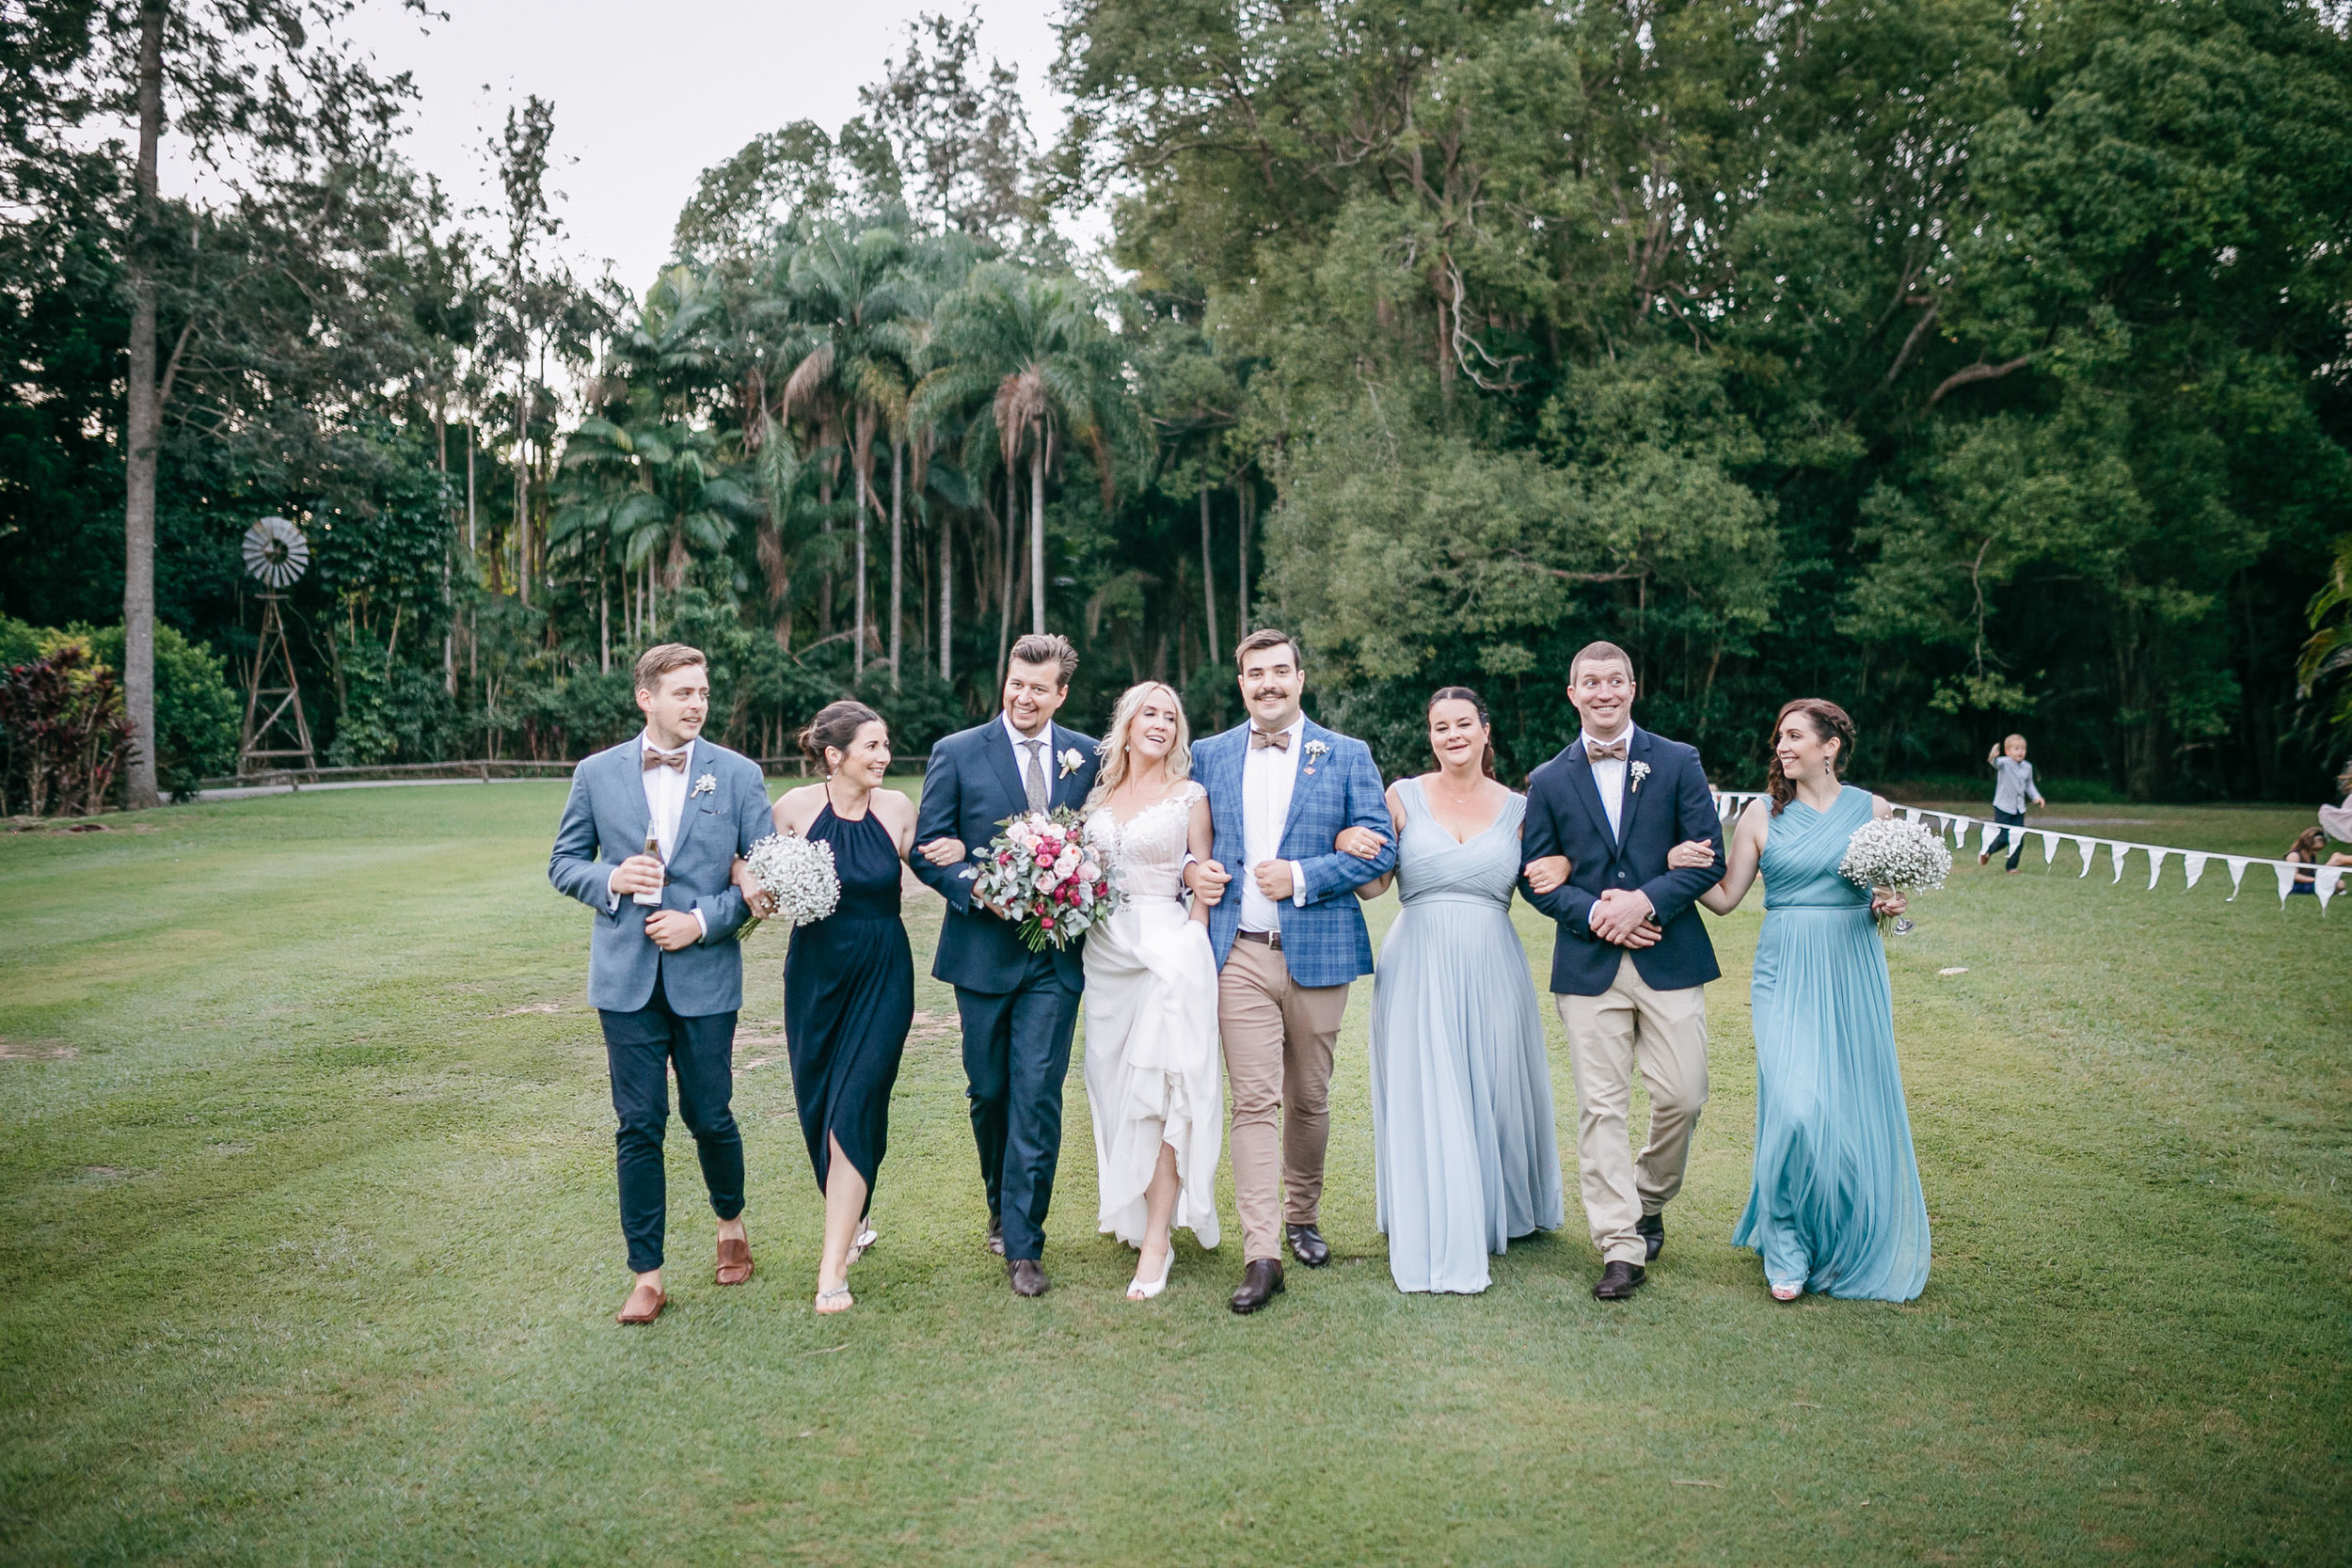 True North Photography_Boomerang Farm_Stacey and Isaac_Gold Coast Wedding_Barm Wedding_Hinterland Wedding-160.jpg